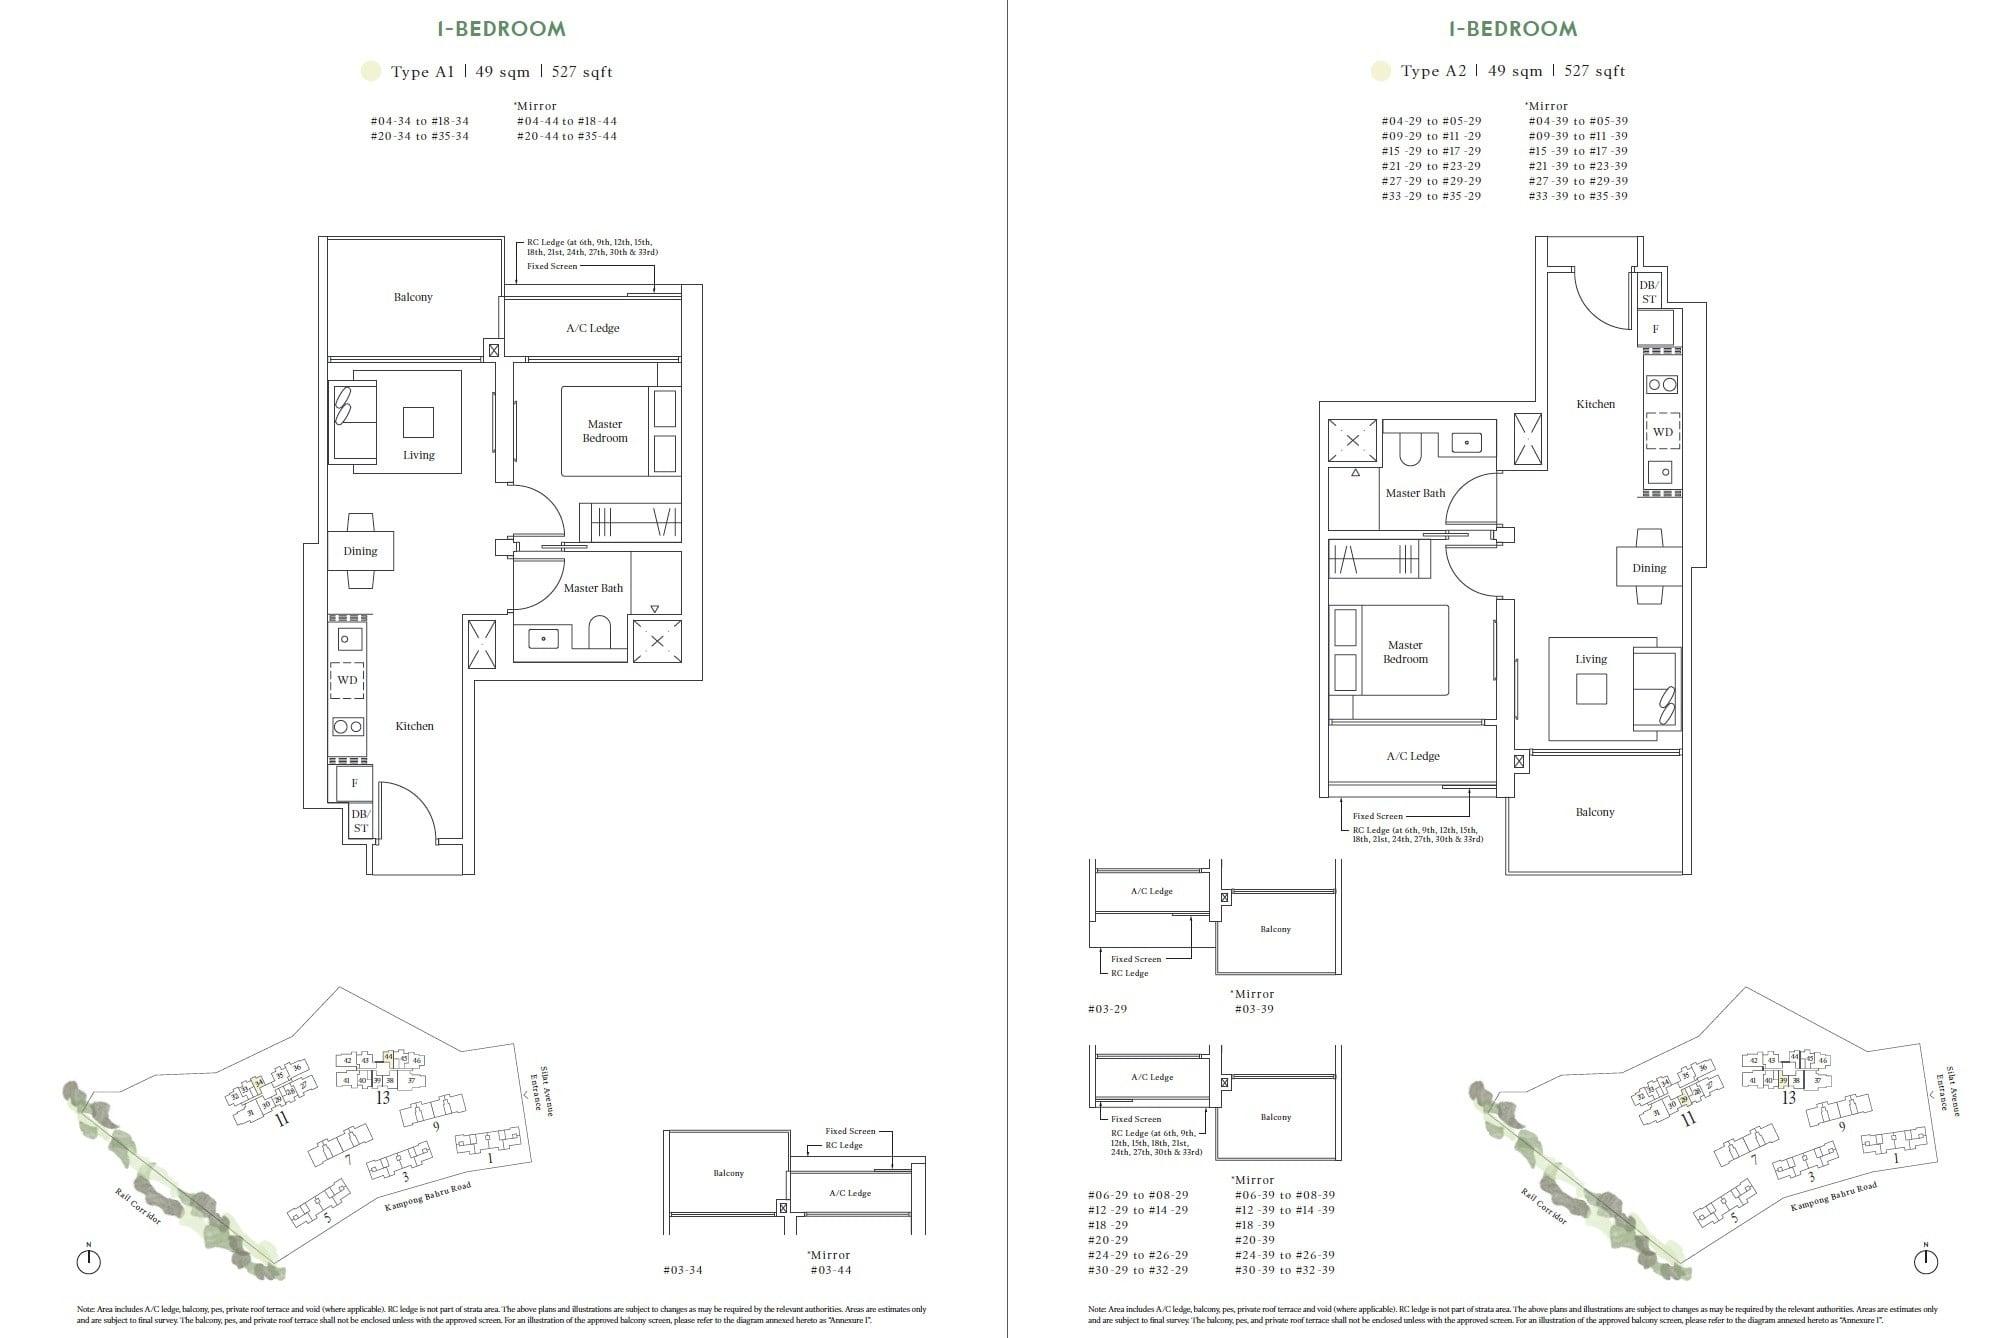 Avenue-South-Residences-FloorPlan 1BR